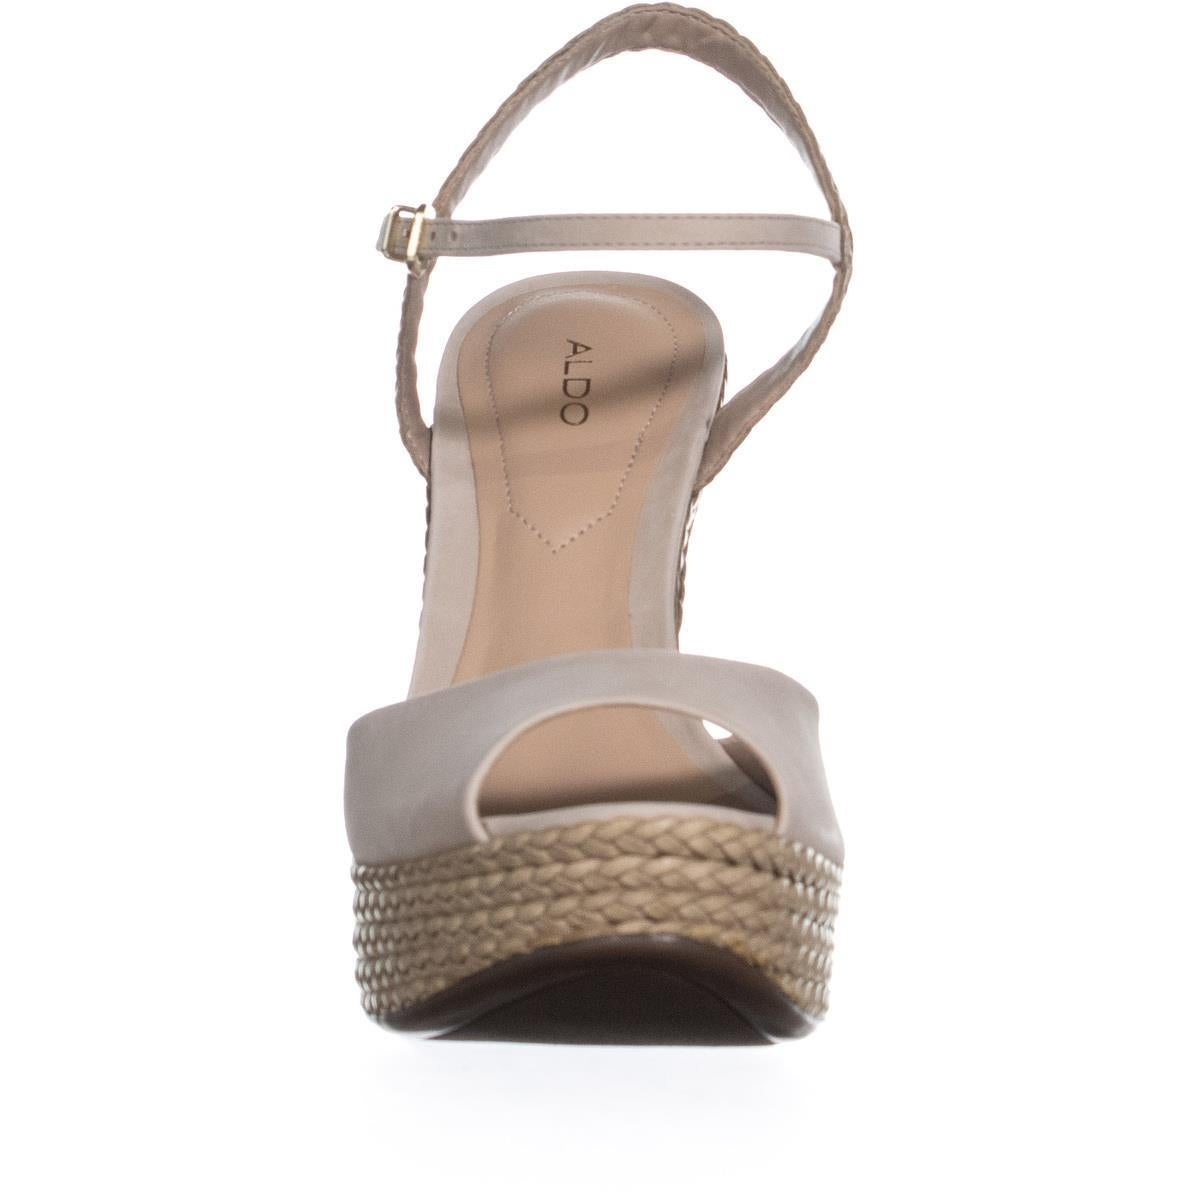 d6f65ec06c80 Shop Aldo Shizuko Ankle-Strap Wedge Sandals